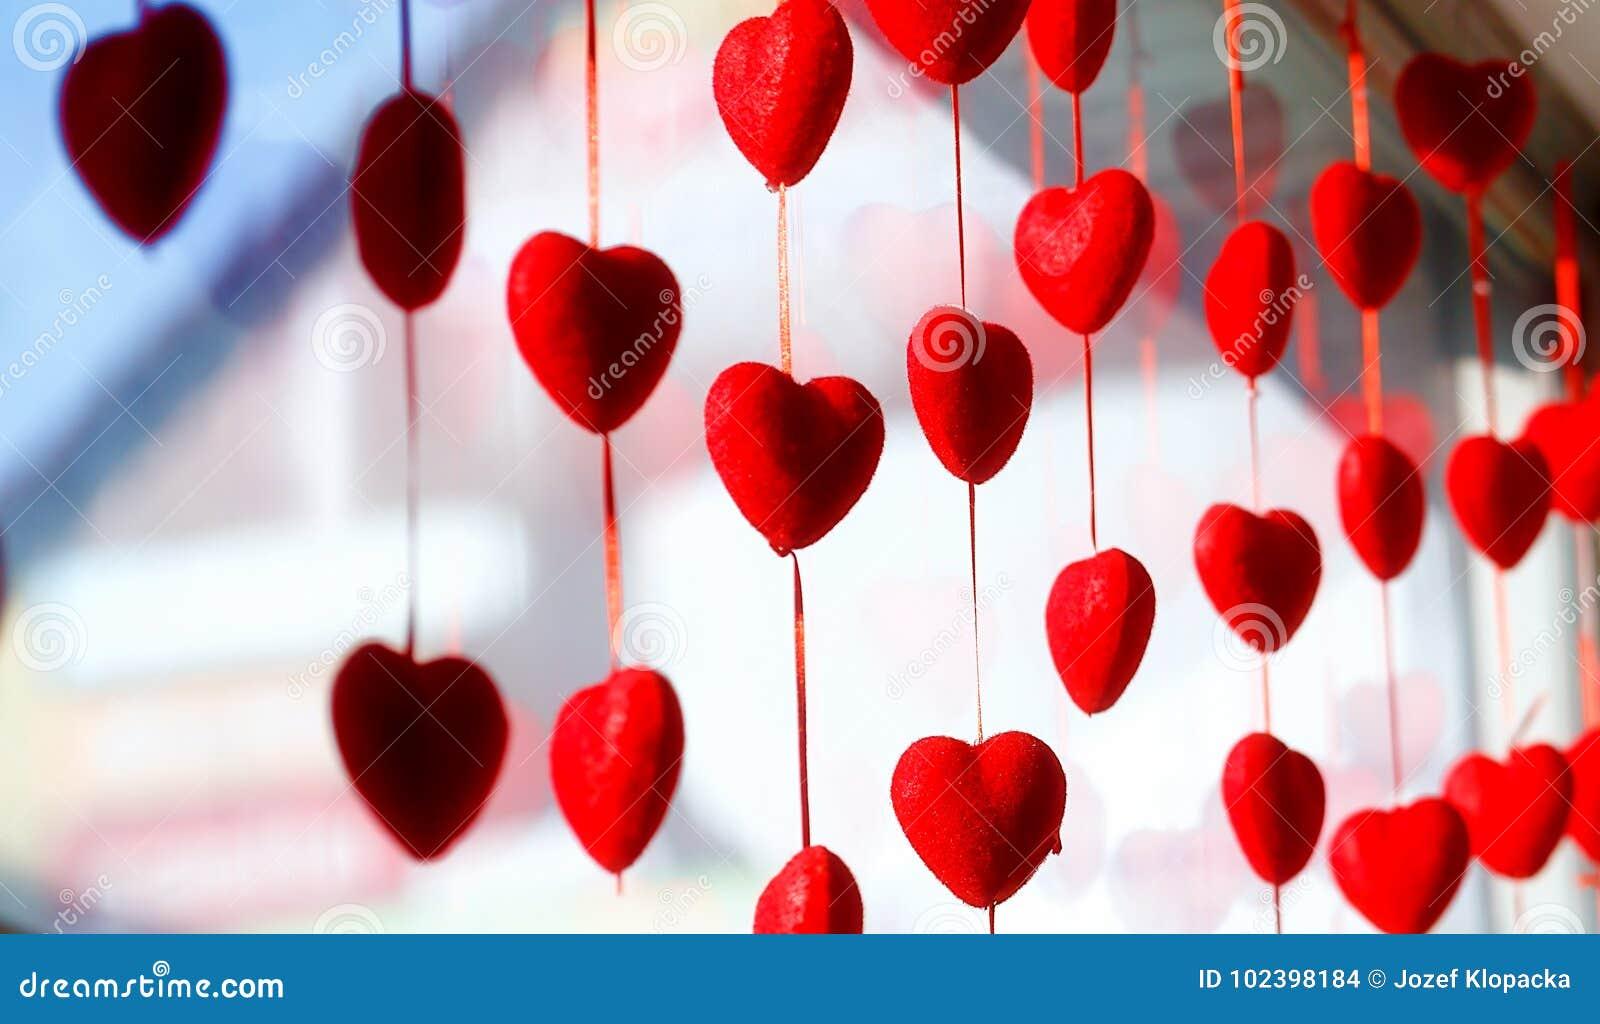 Valentine s day background with hearts. Valentine heart.